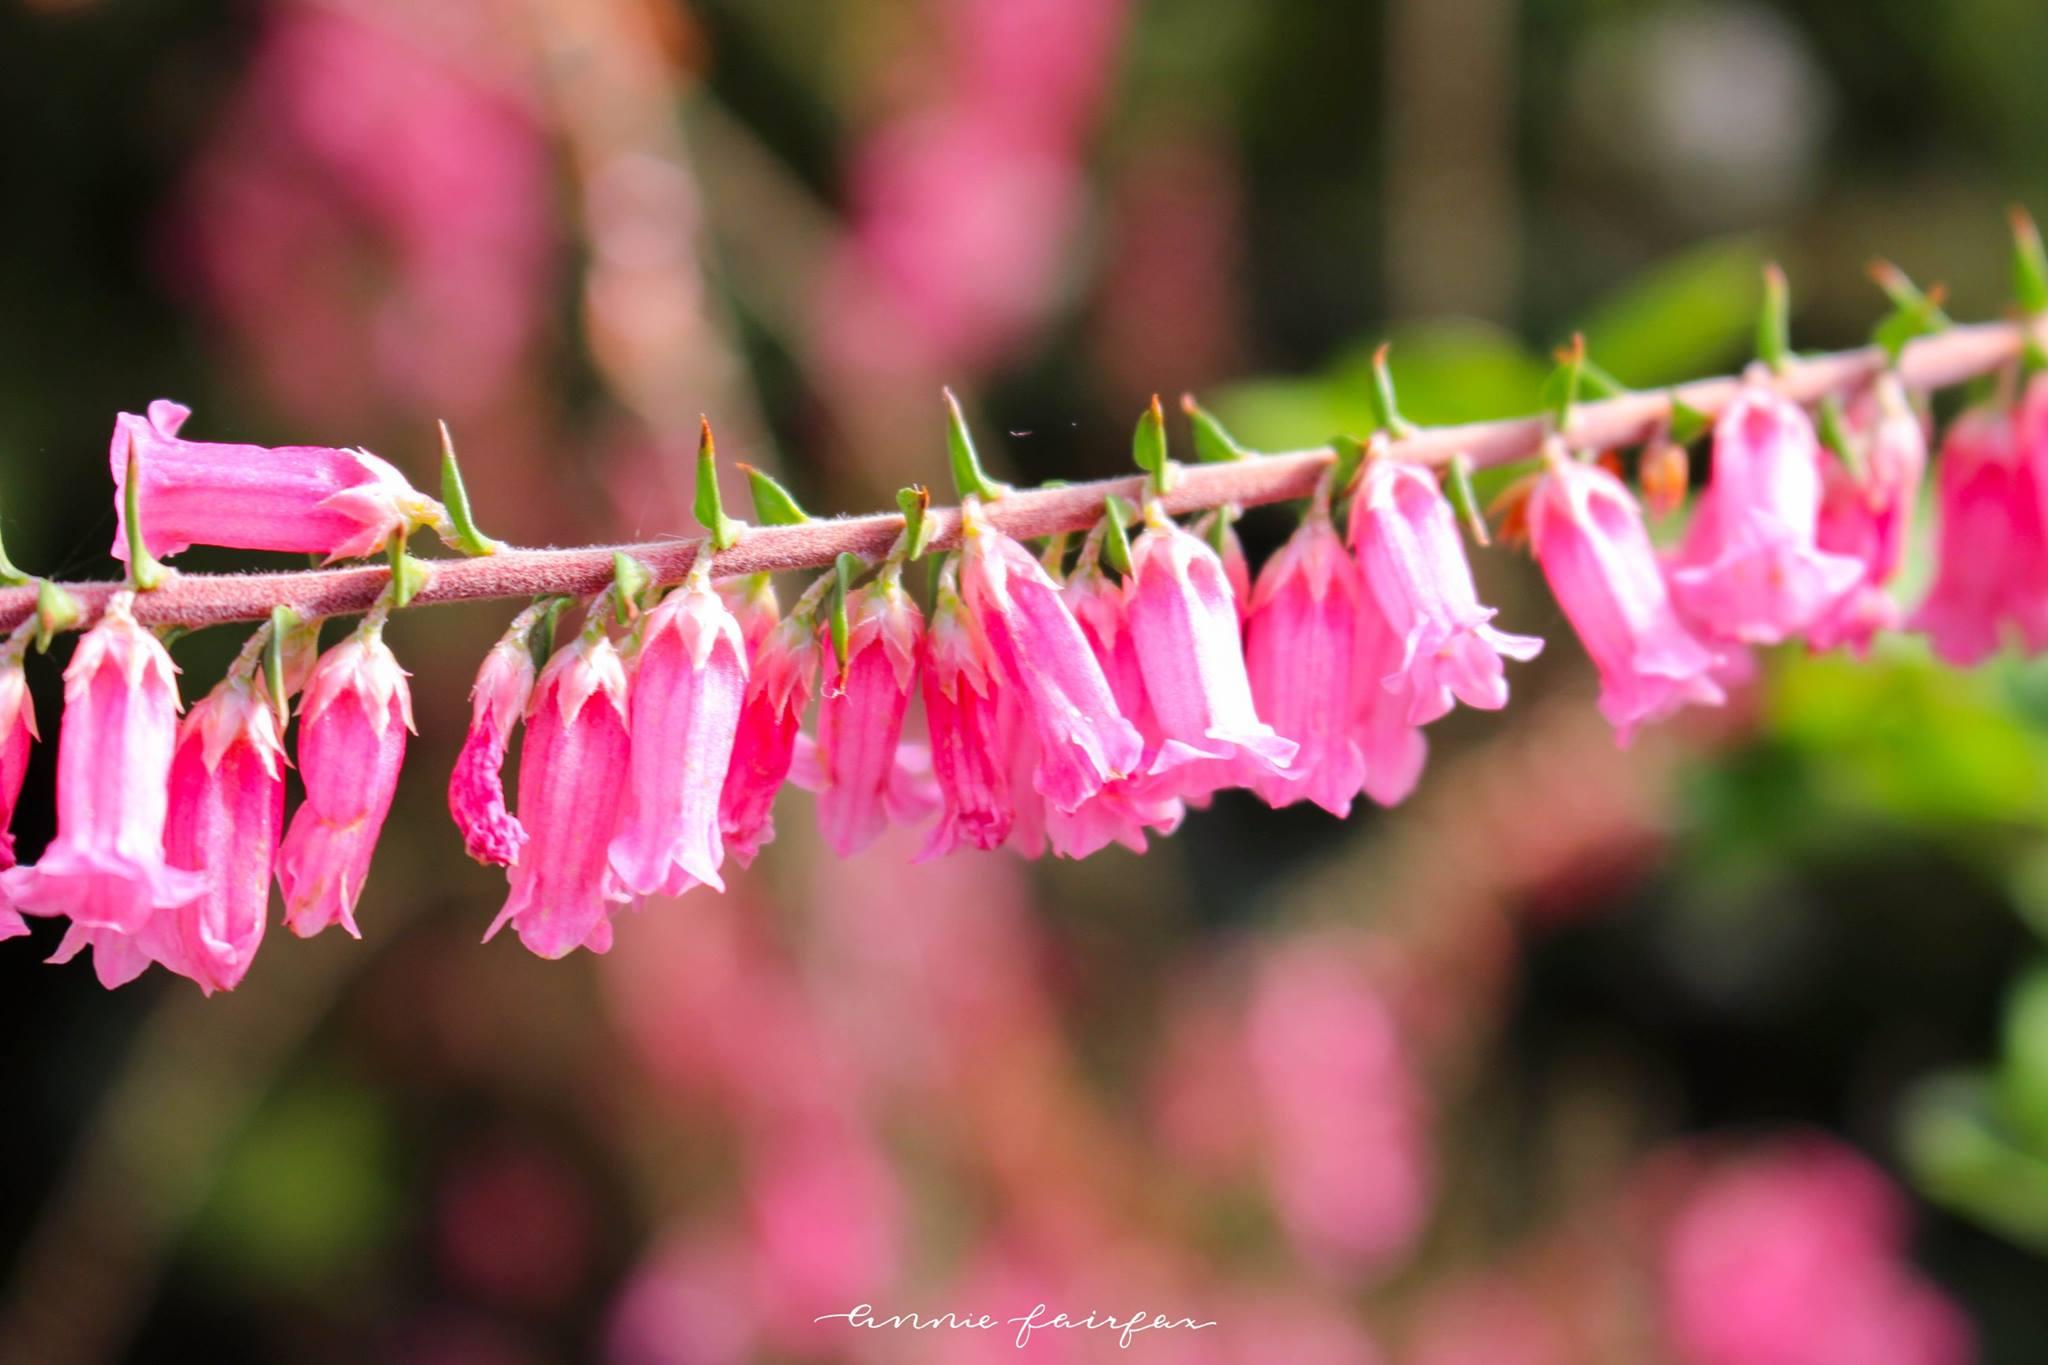 Plant Flower Photography By Annie Fairfax